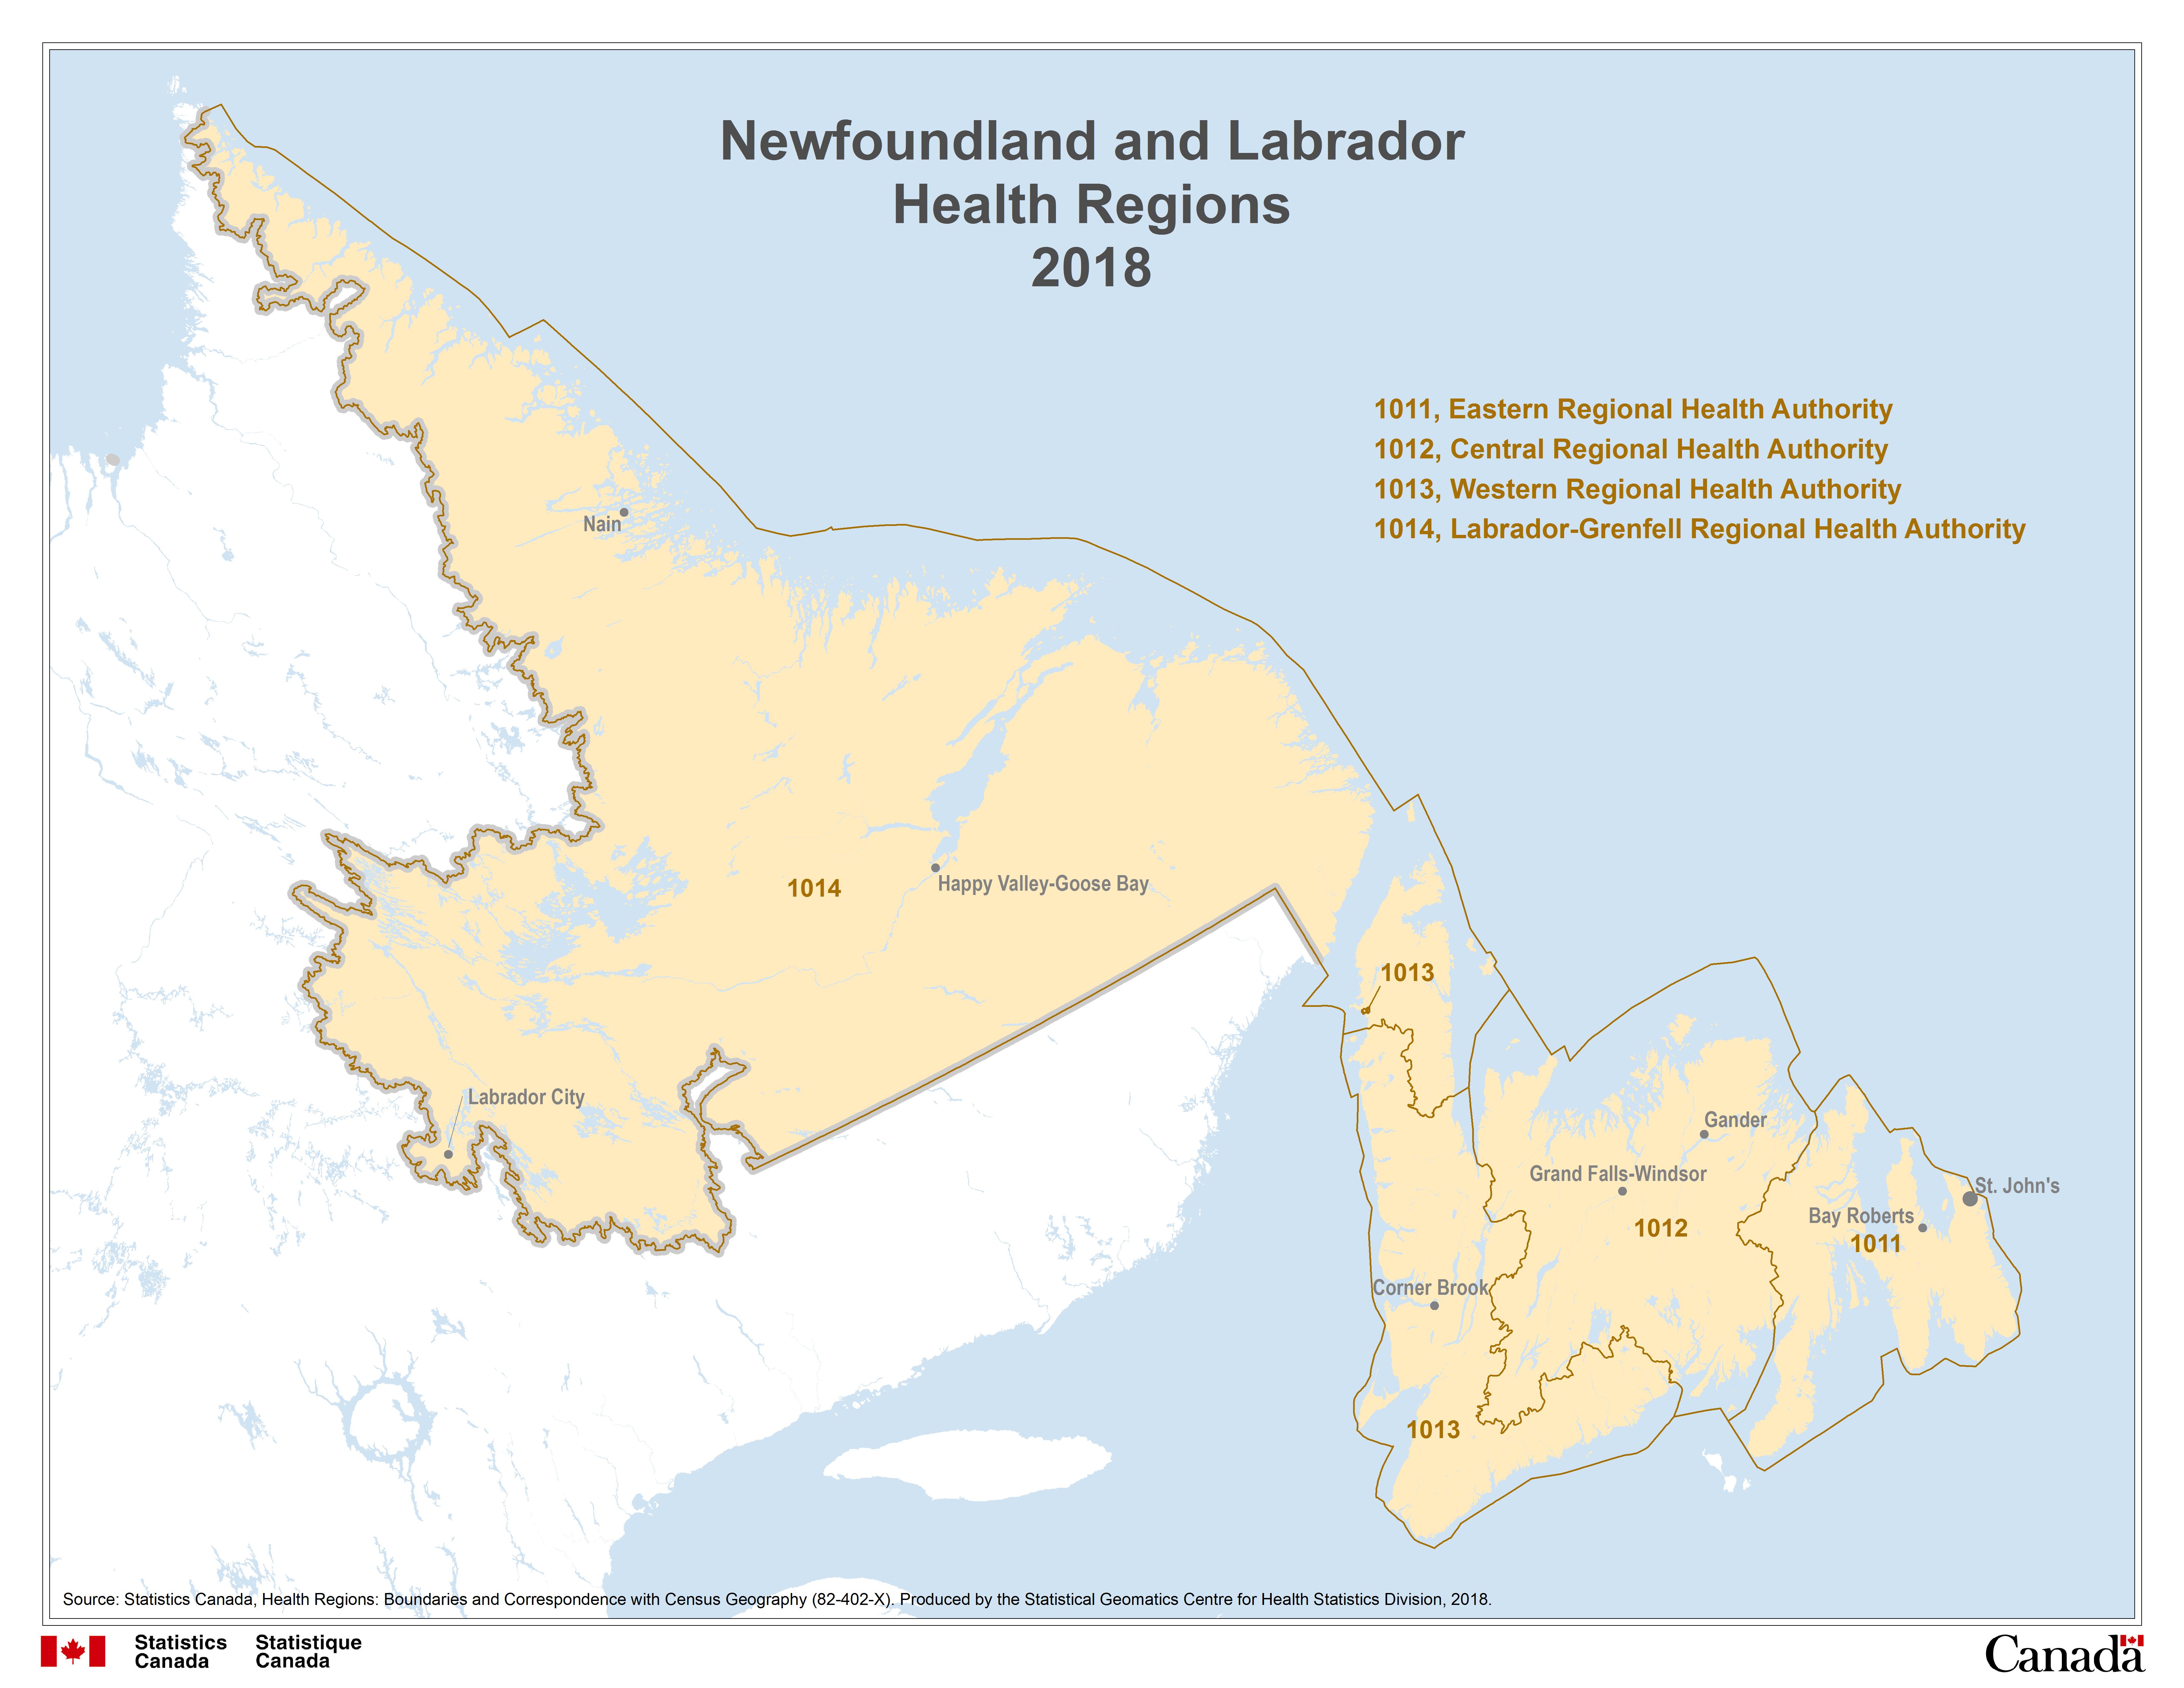 Gander Canada Map.Map 1 Newfoundland And Labrador Health Regions 2018